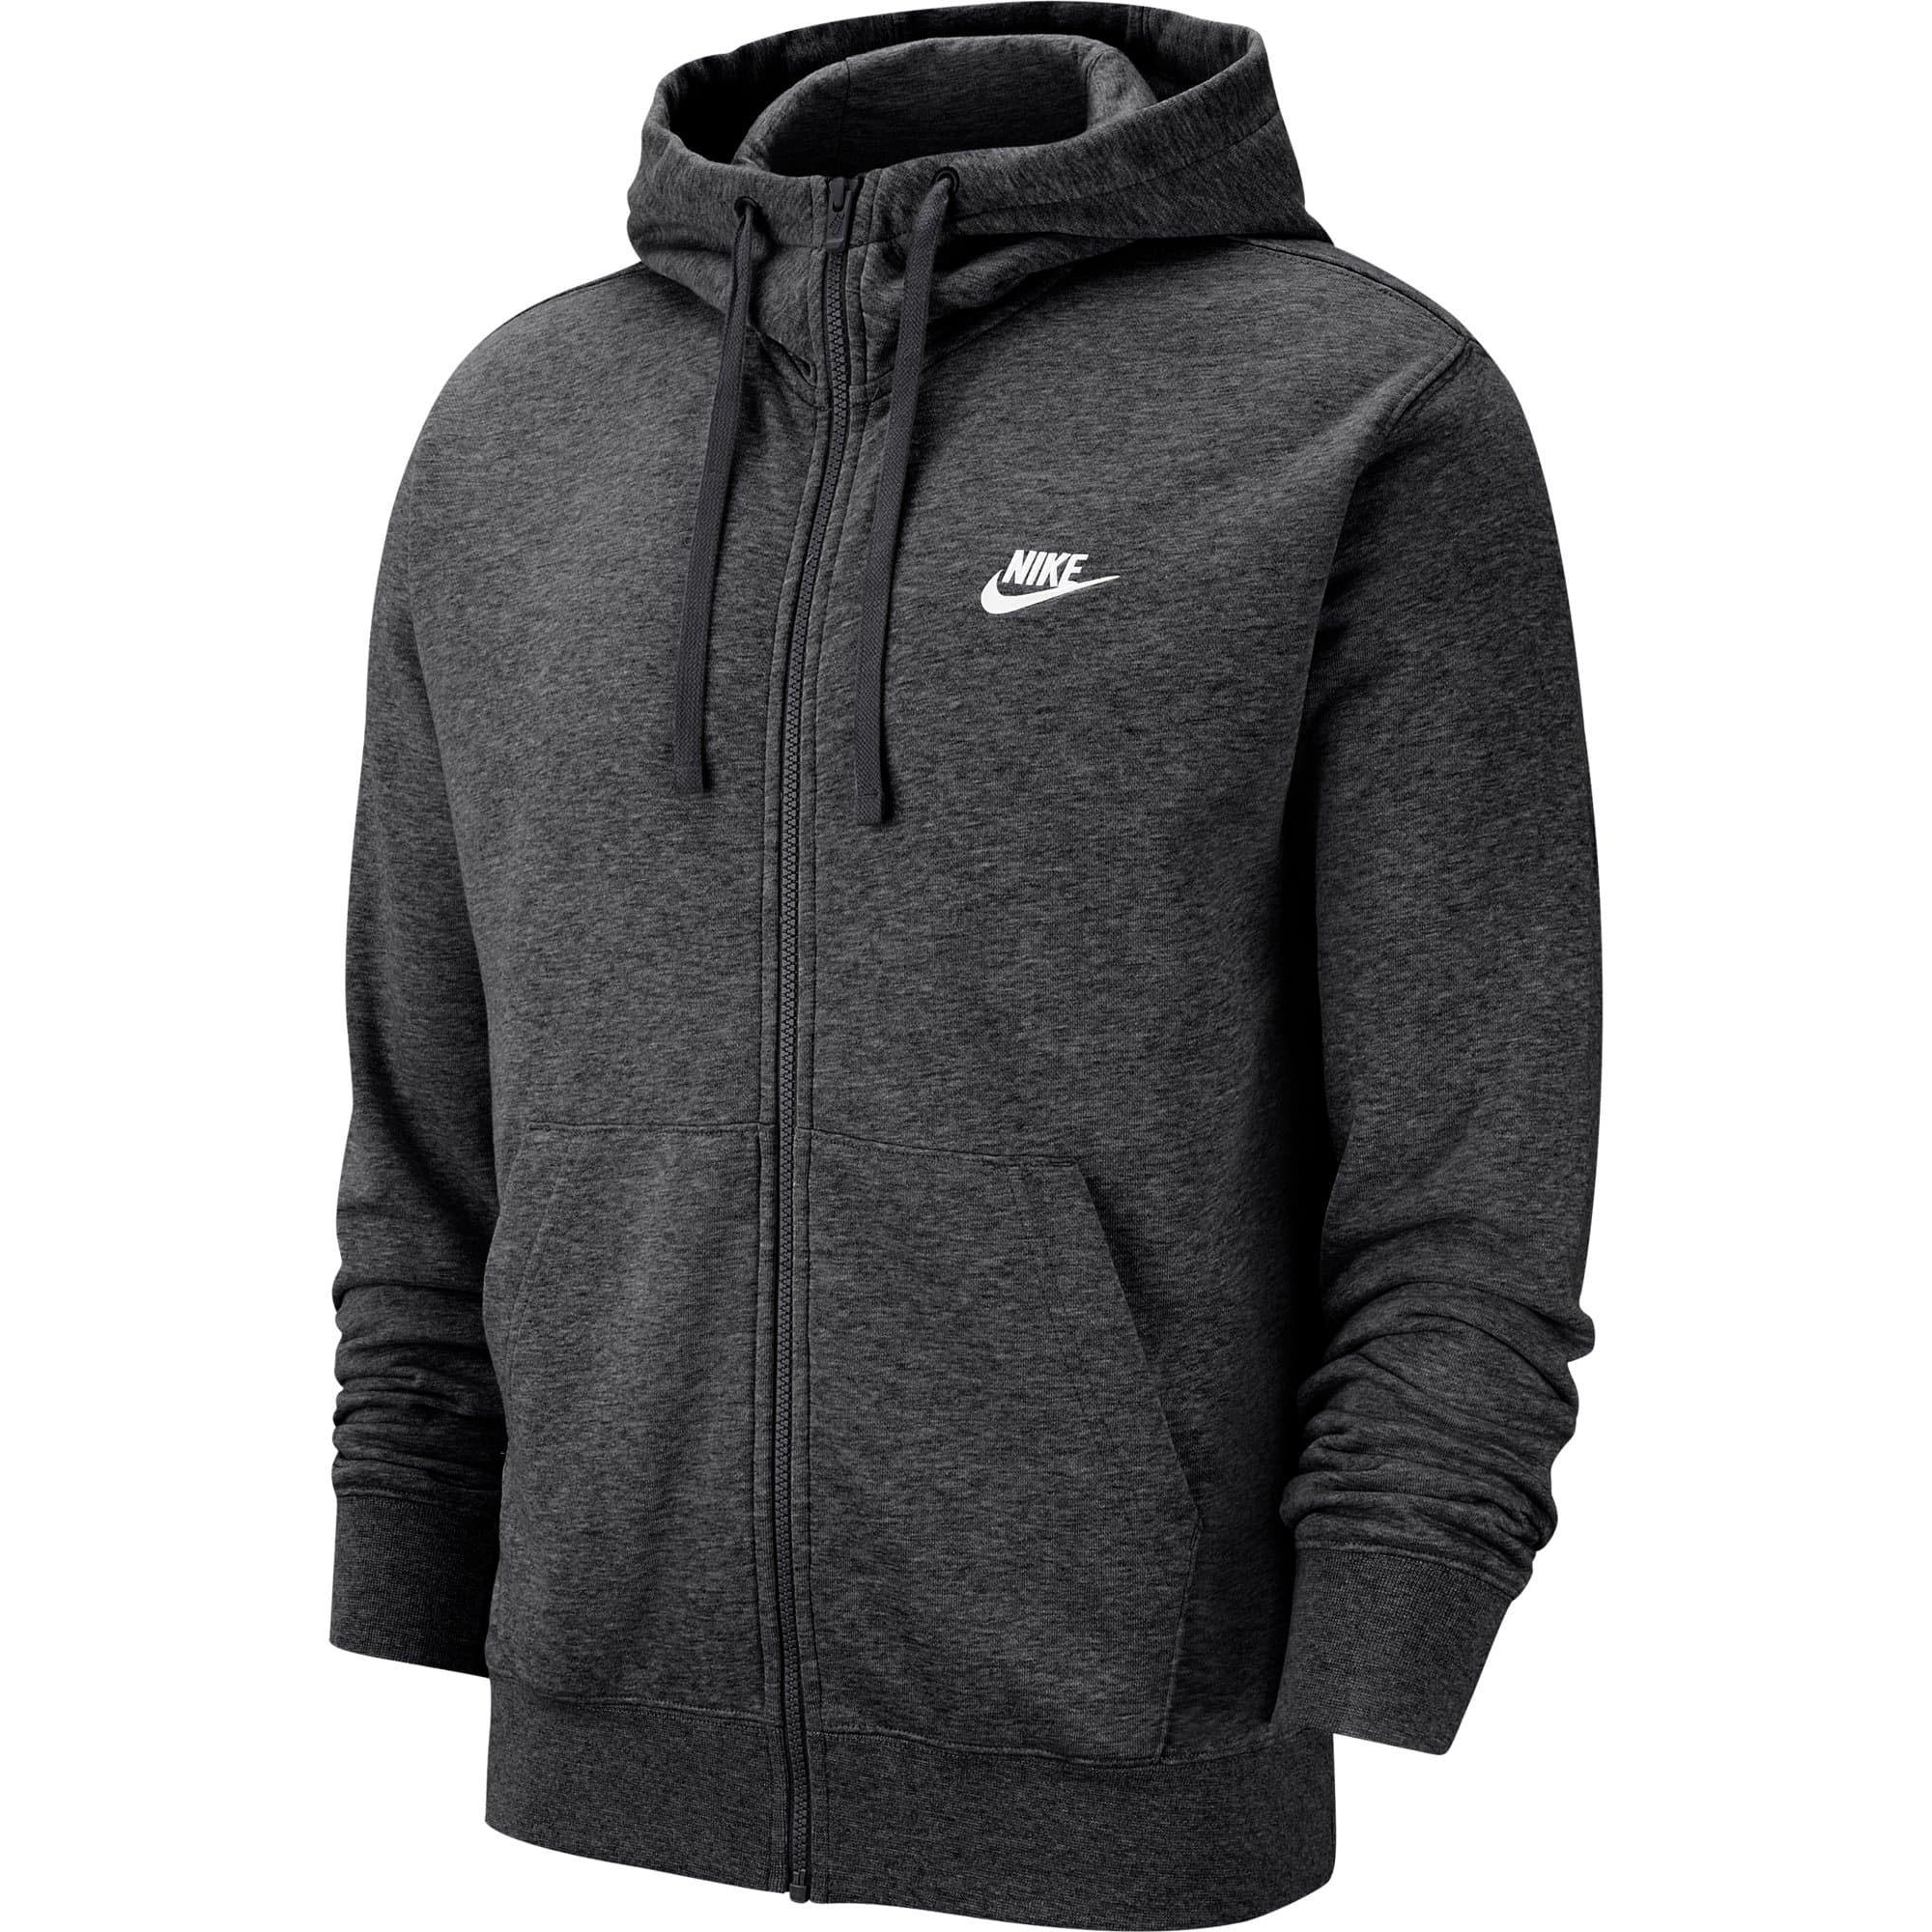 Nike Men's Sportswear Full Zip Hoodie Veste à capuche pour homme